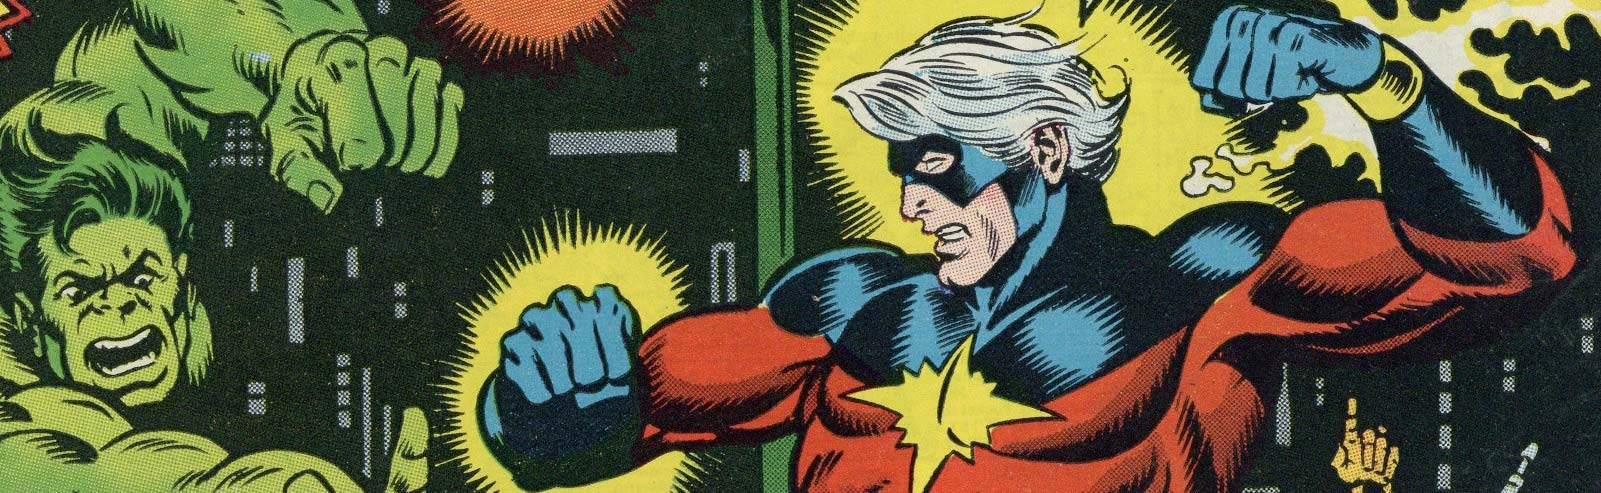 Captain Marvel Jim Starlin